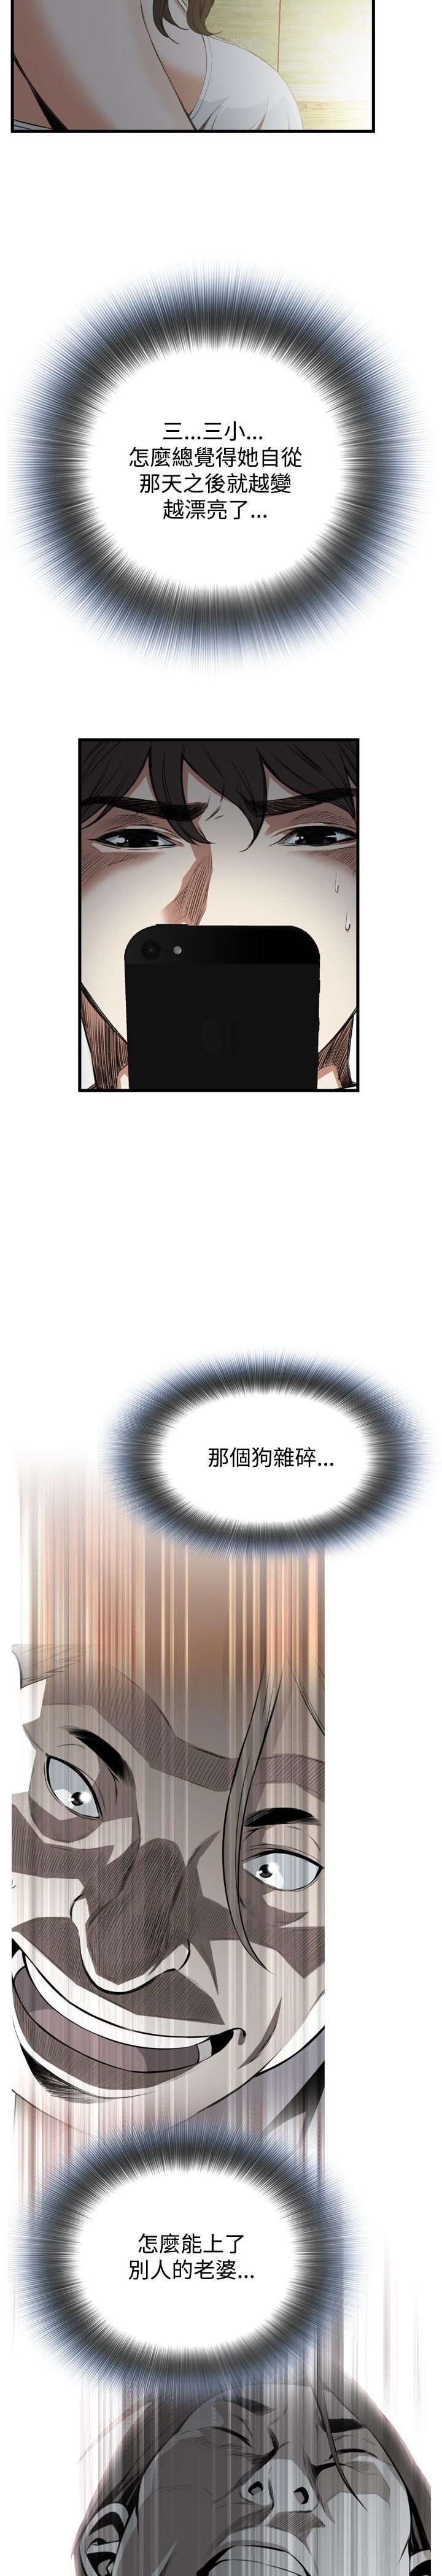 Take a Peek 偷窥 Ch.39~51 [Chinese]中文 188